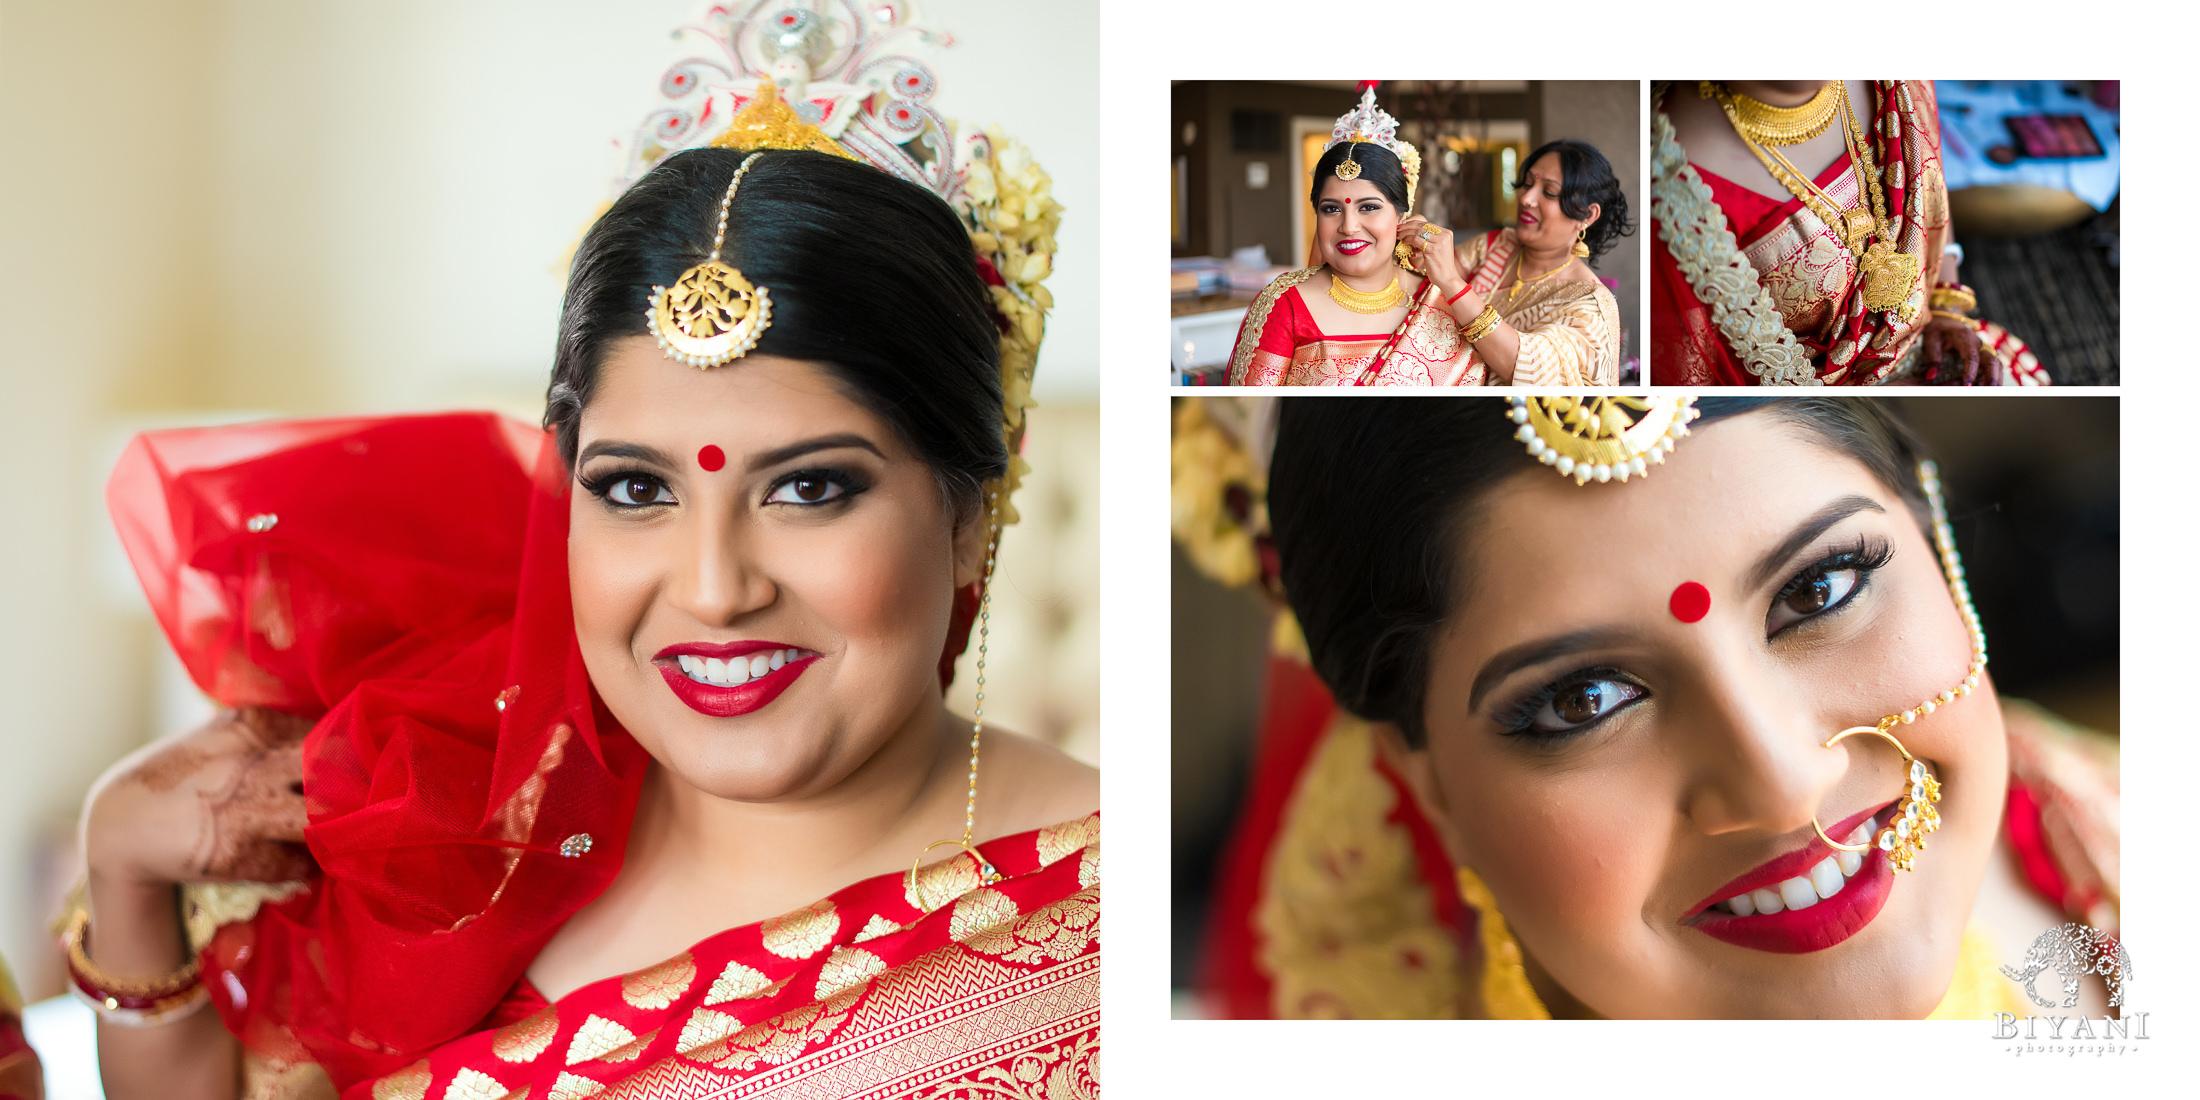 Bengali Bride Getting Ready